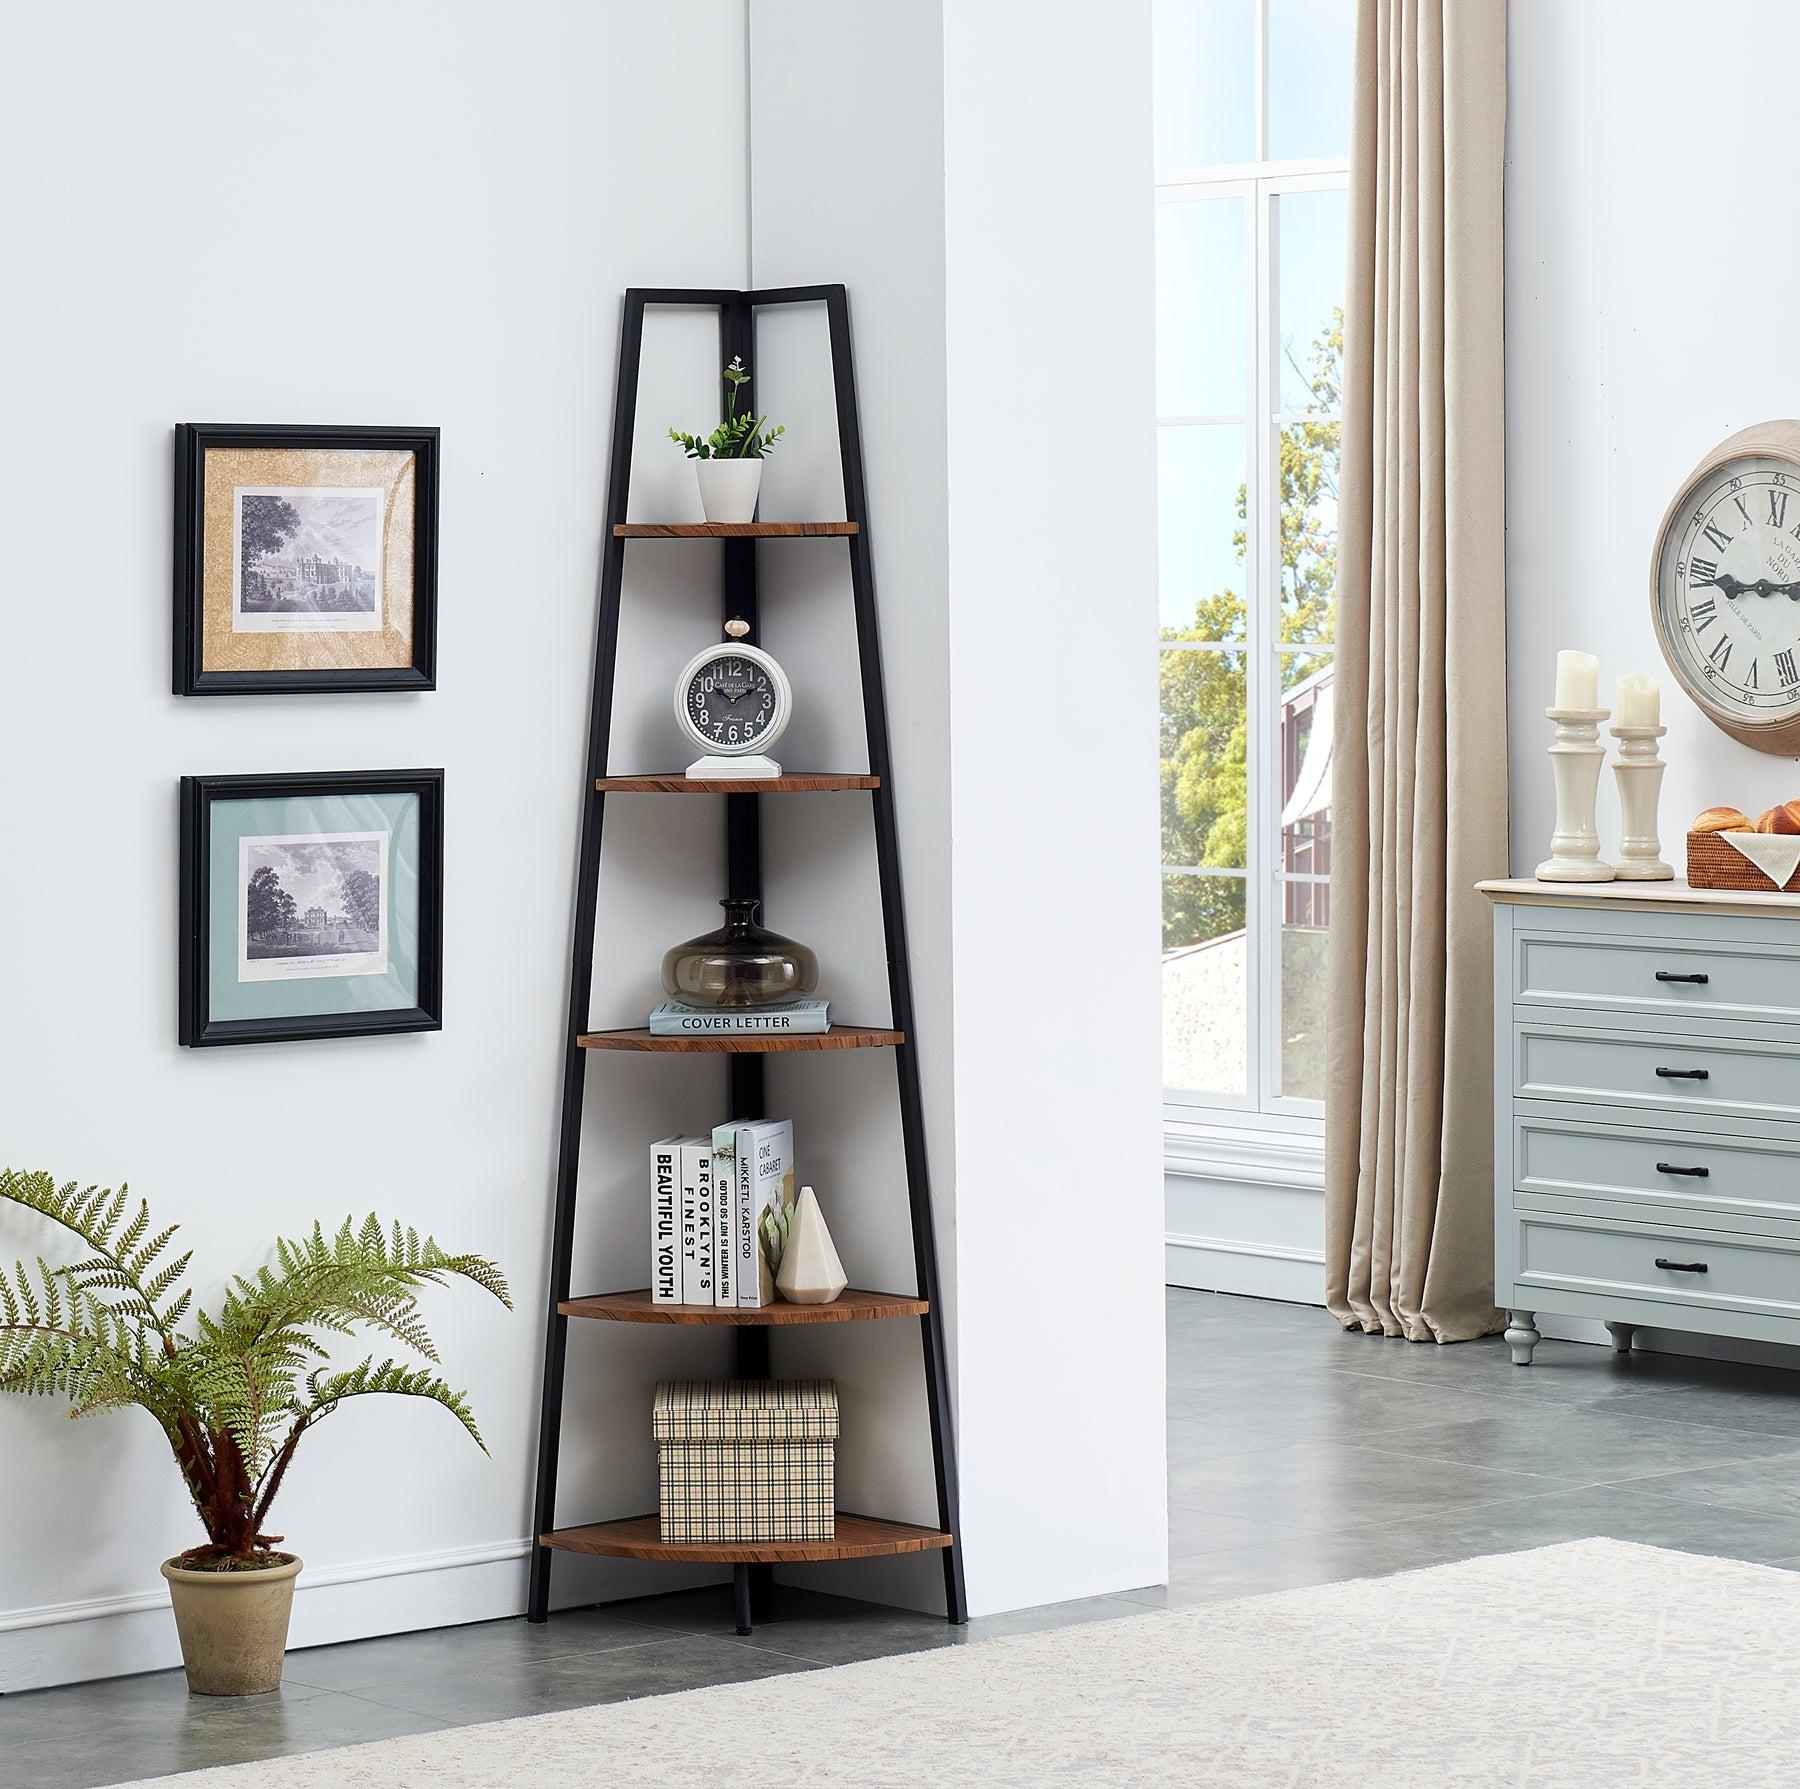 EZI 5 Tier A-Shaped Industrial Corner Shelves Retro Brown